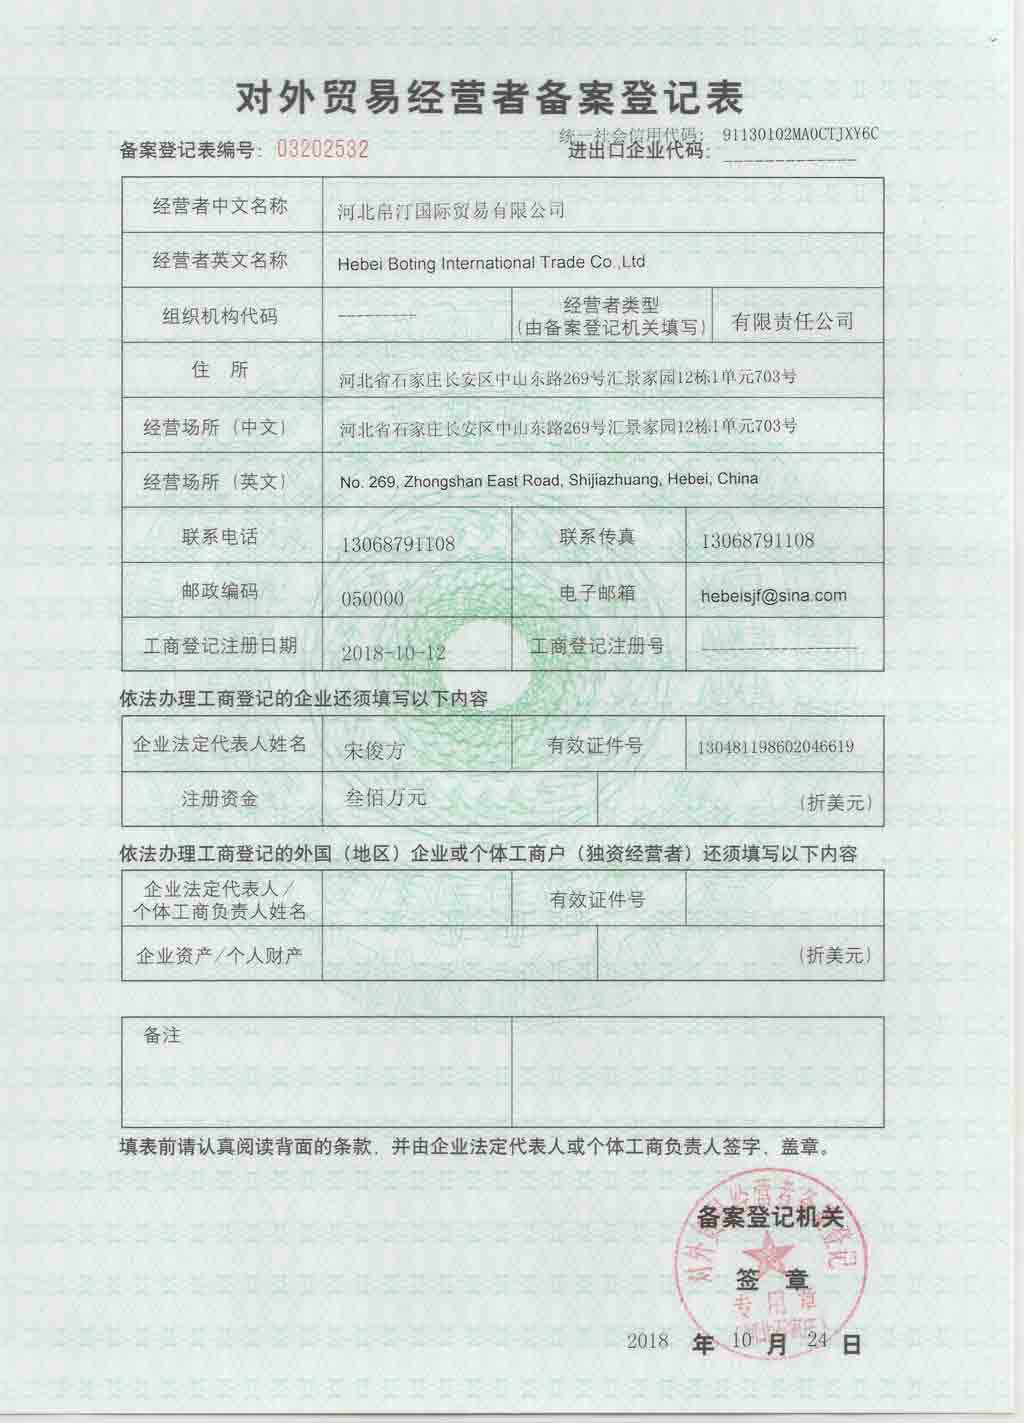 Foreign Trade Operator Registration